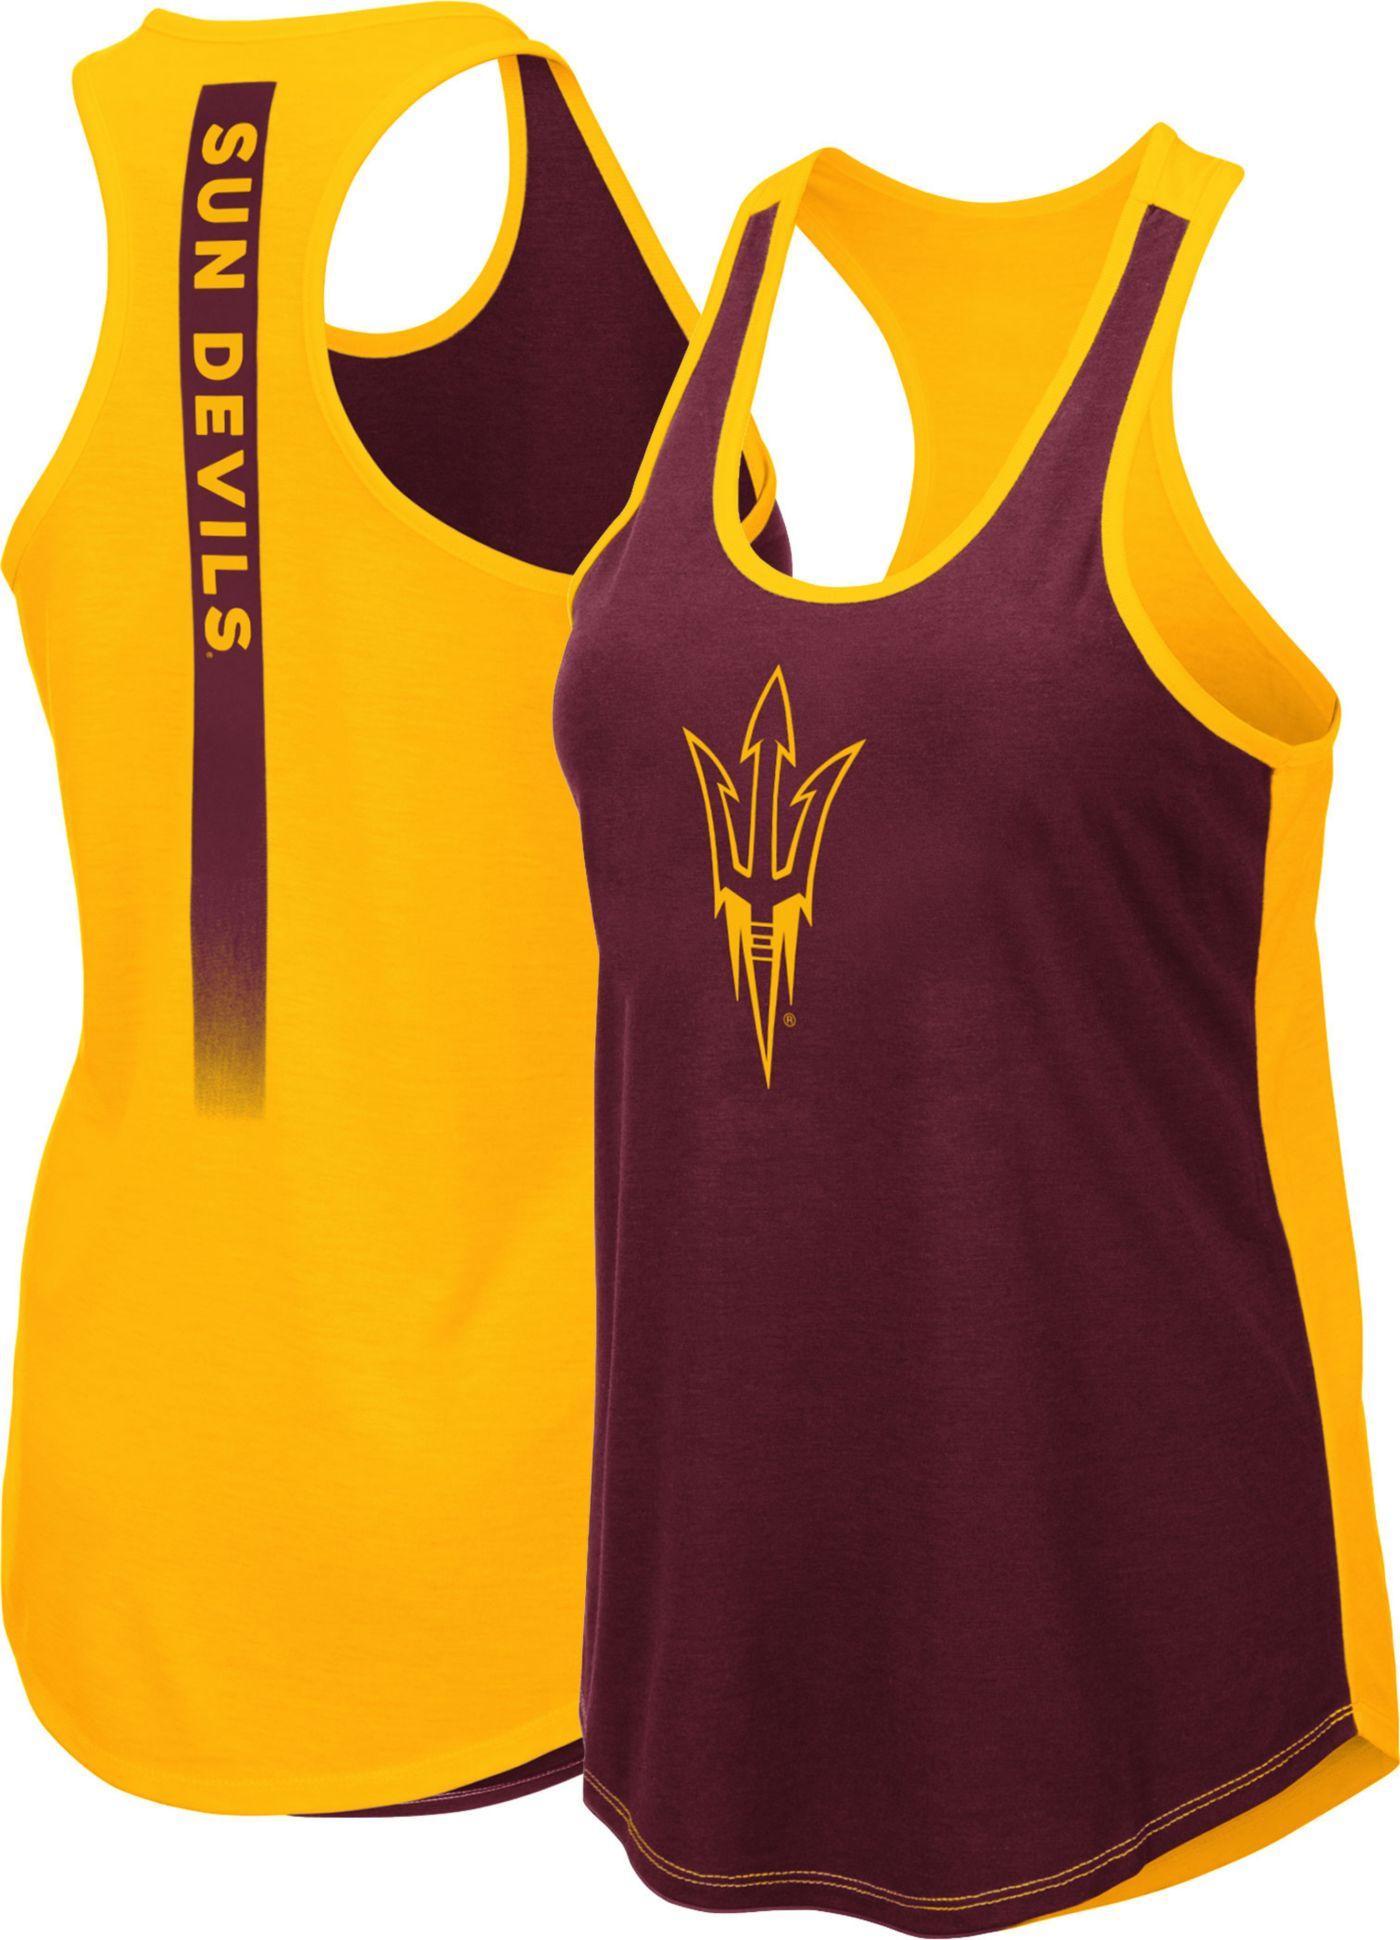 Colosseum Women's Arizona State Sun Devils Gold/Maroon Publicist Tank Top